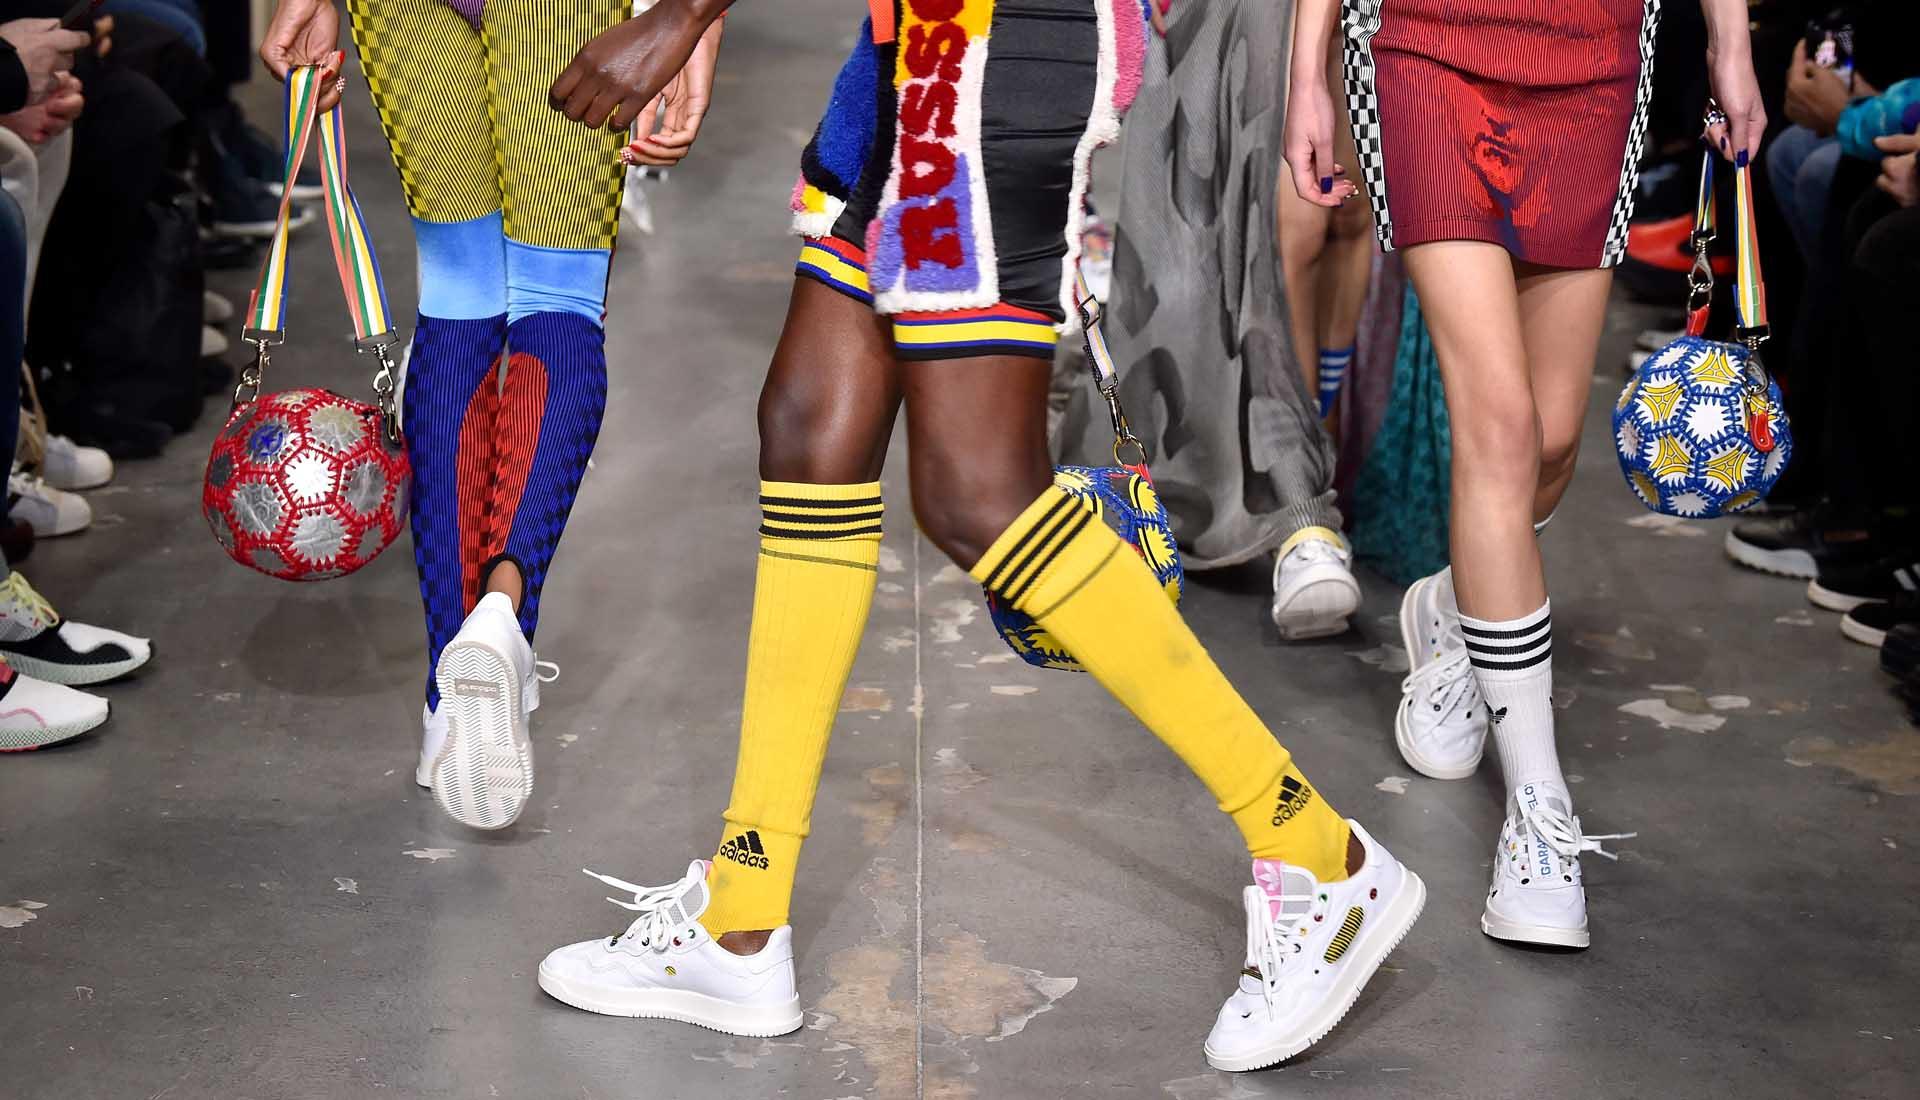 adidas Originals Makerlab Show at Paris Fashion Week - SoccerBible